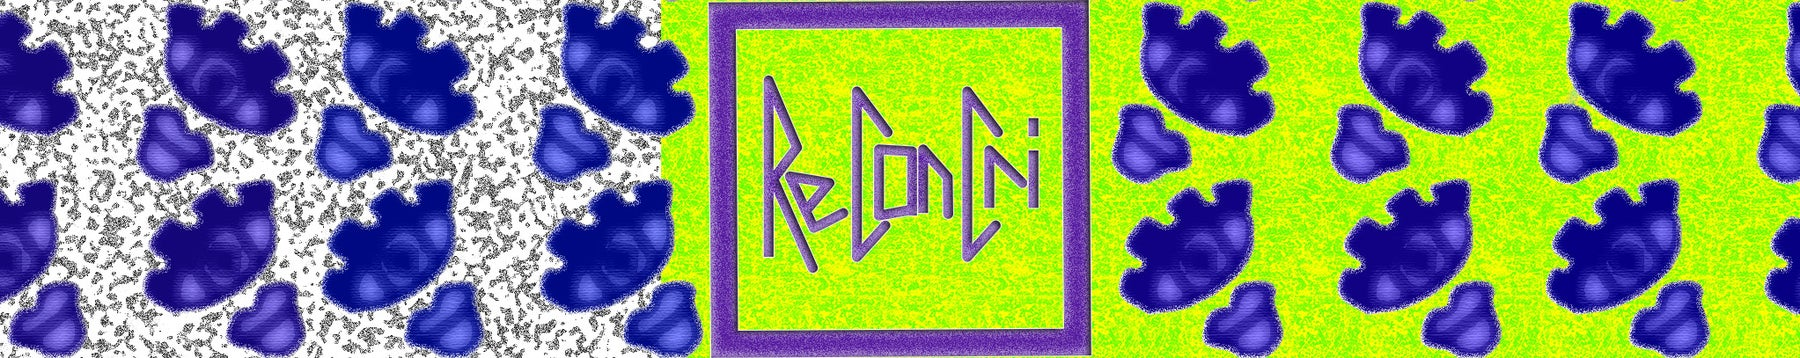 ReConCri